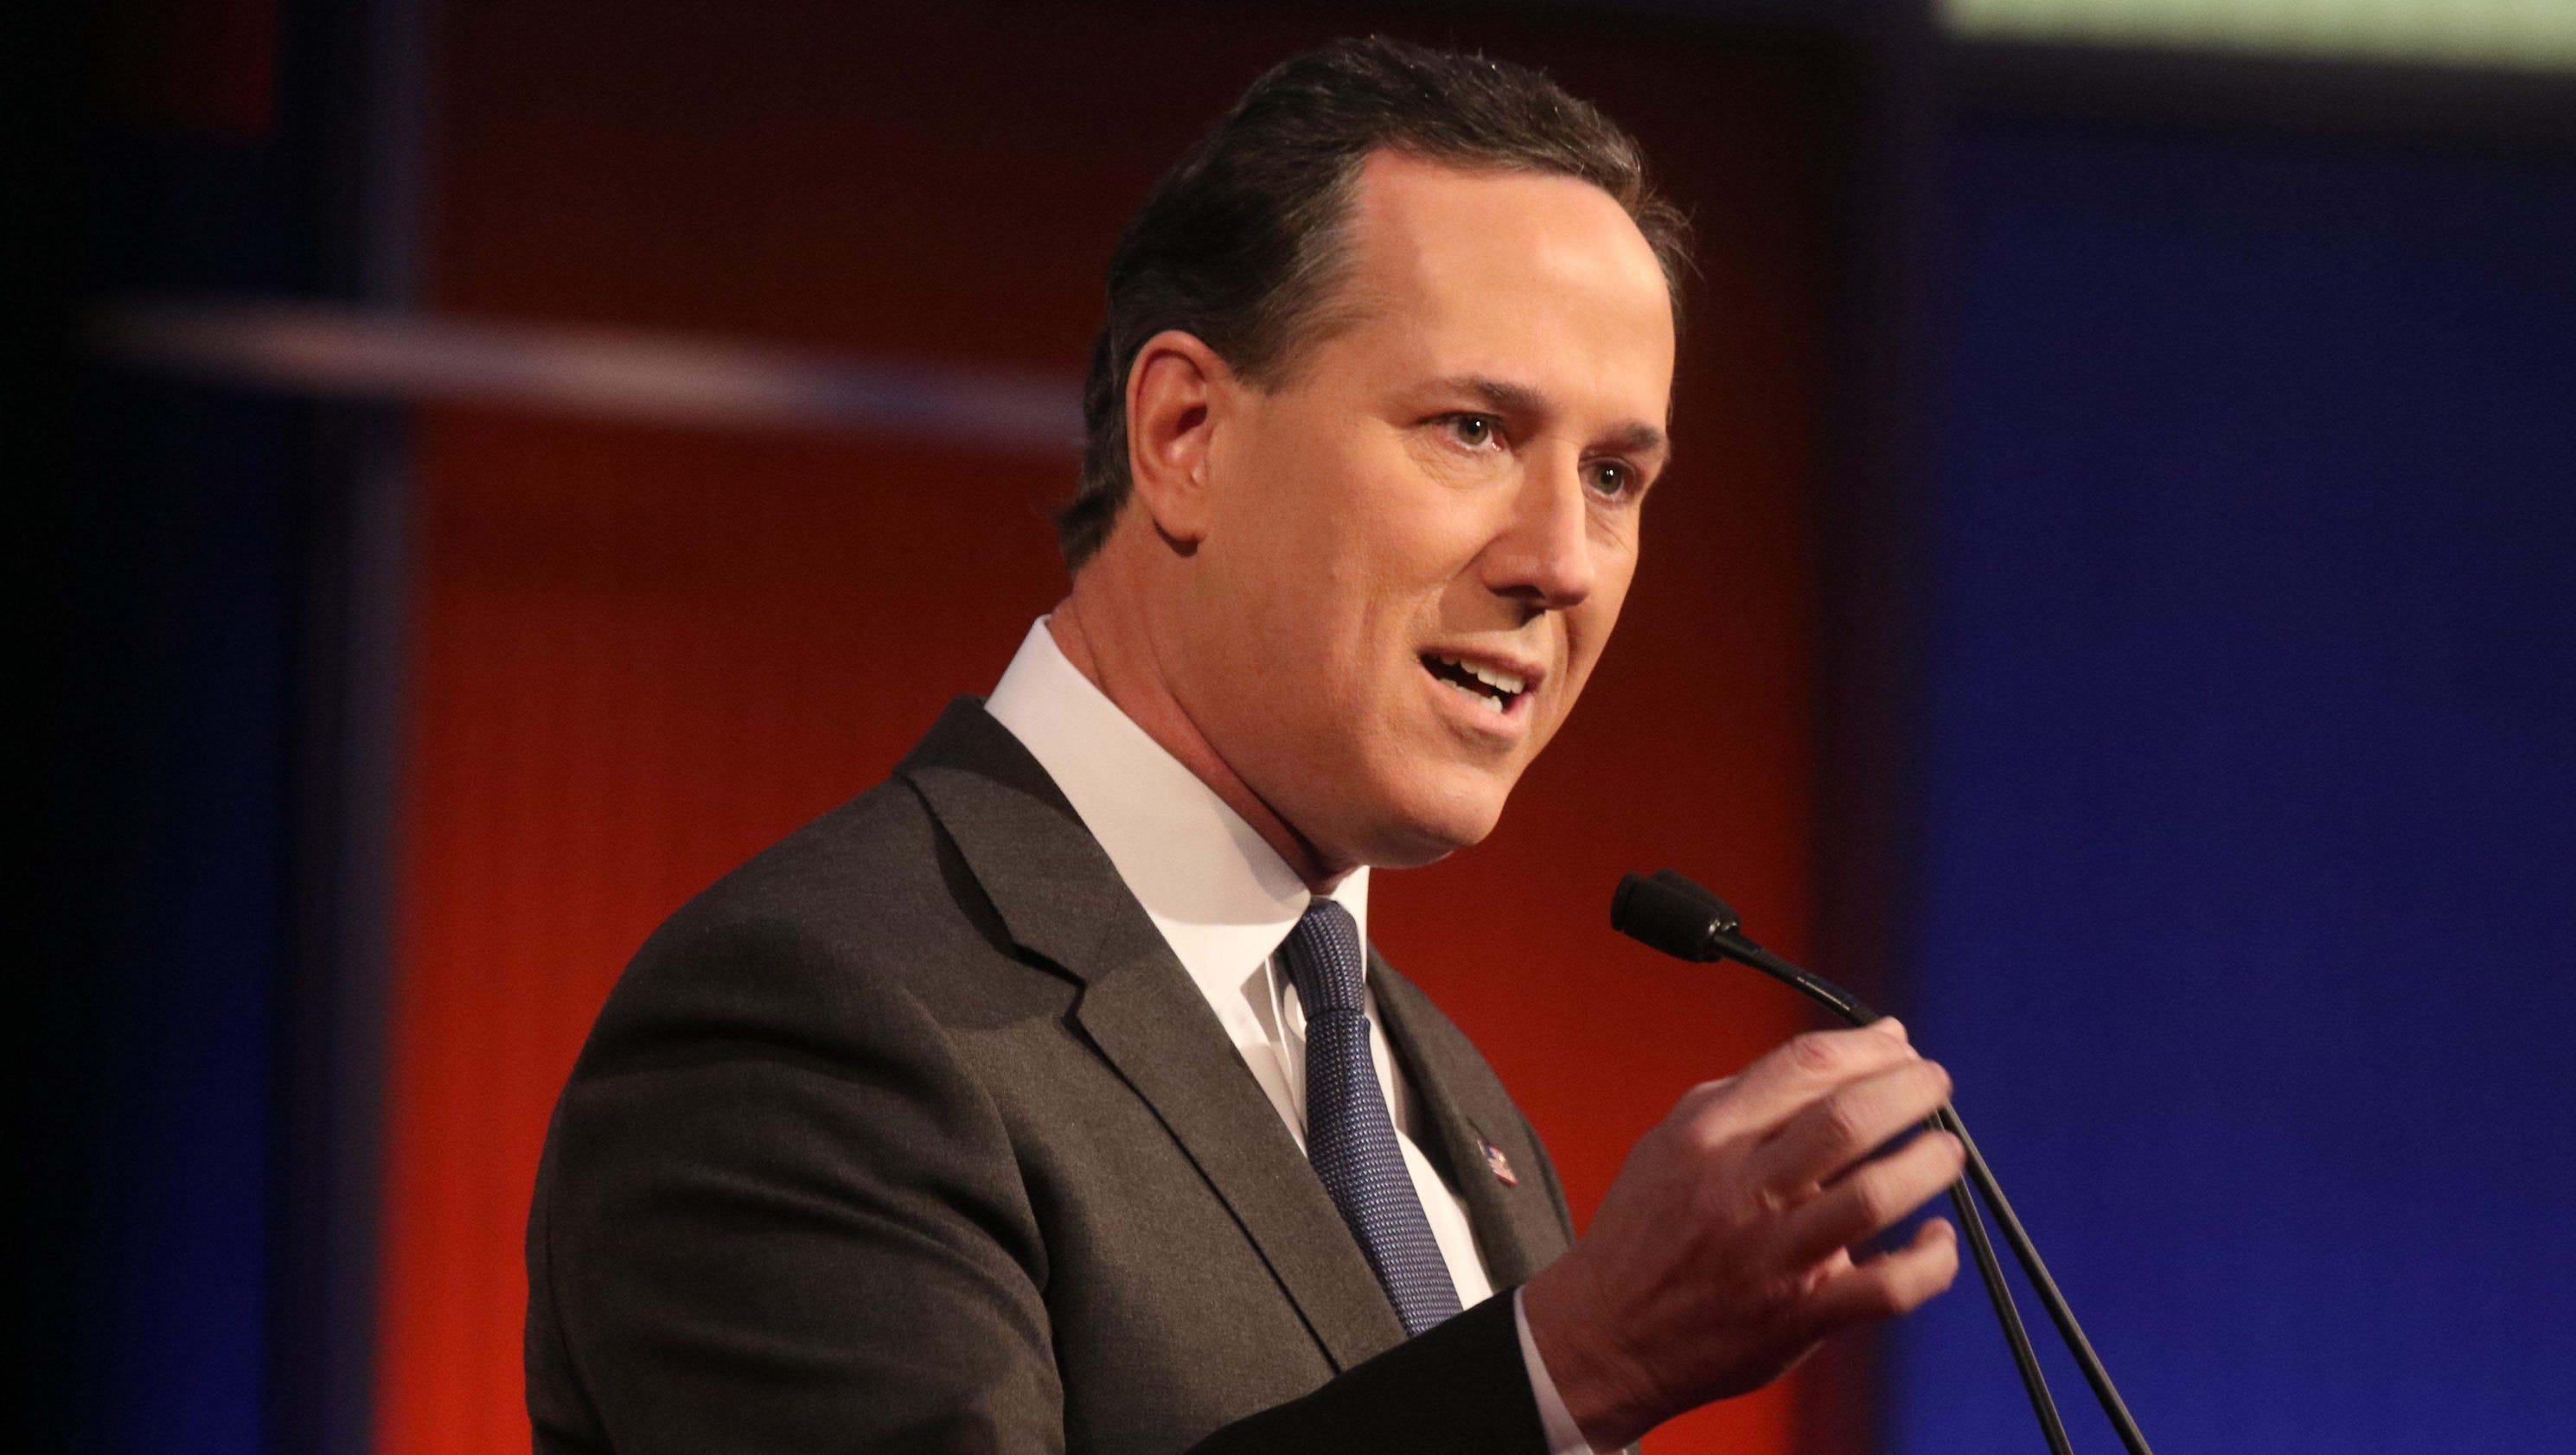 Rick Santorum Can T Name Any Of Marco Rubio S Accomplishments